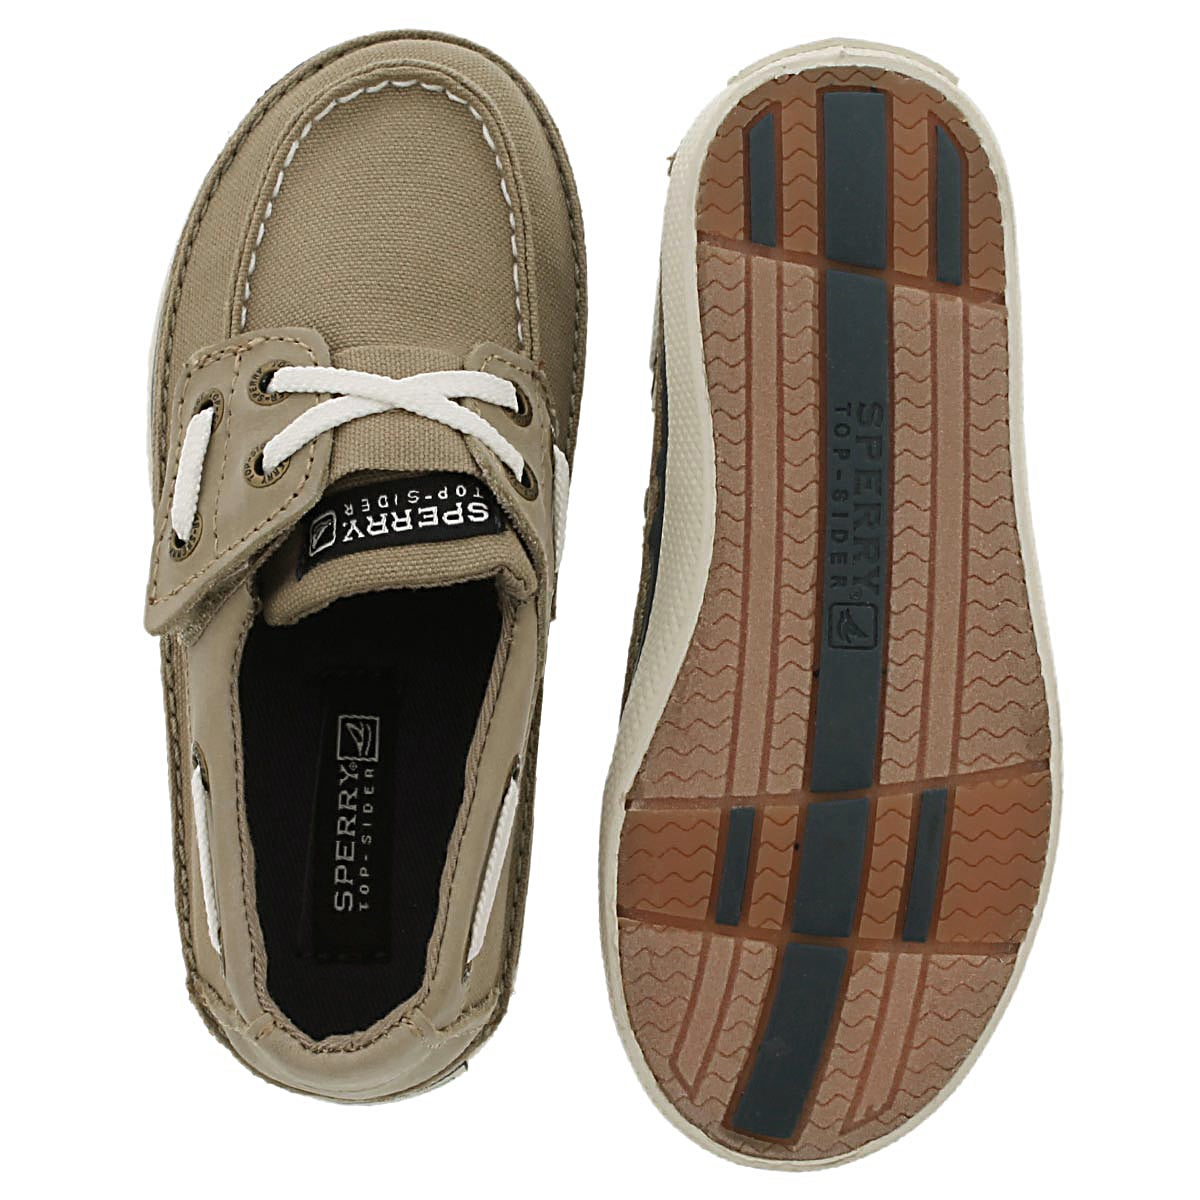 Inf Cruz Jr. khaki boat shoe